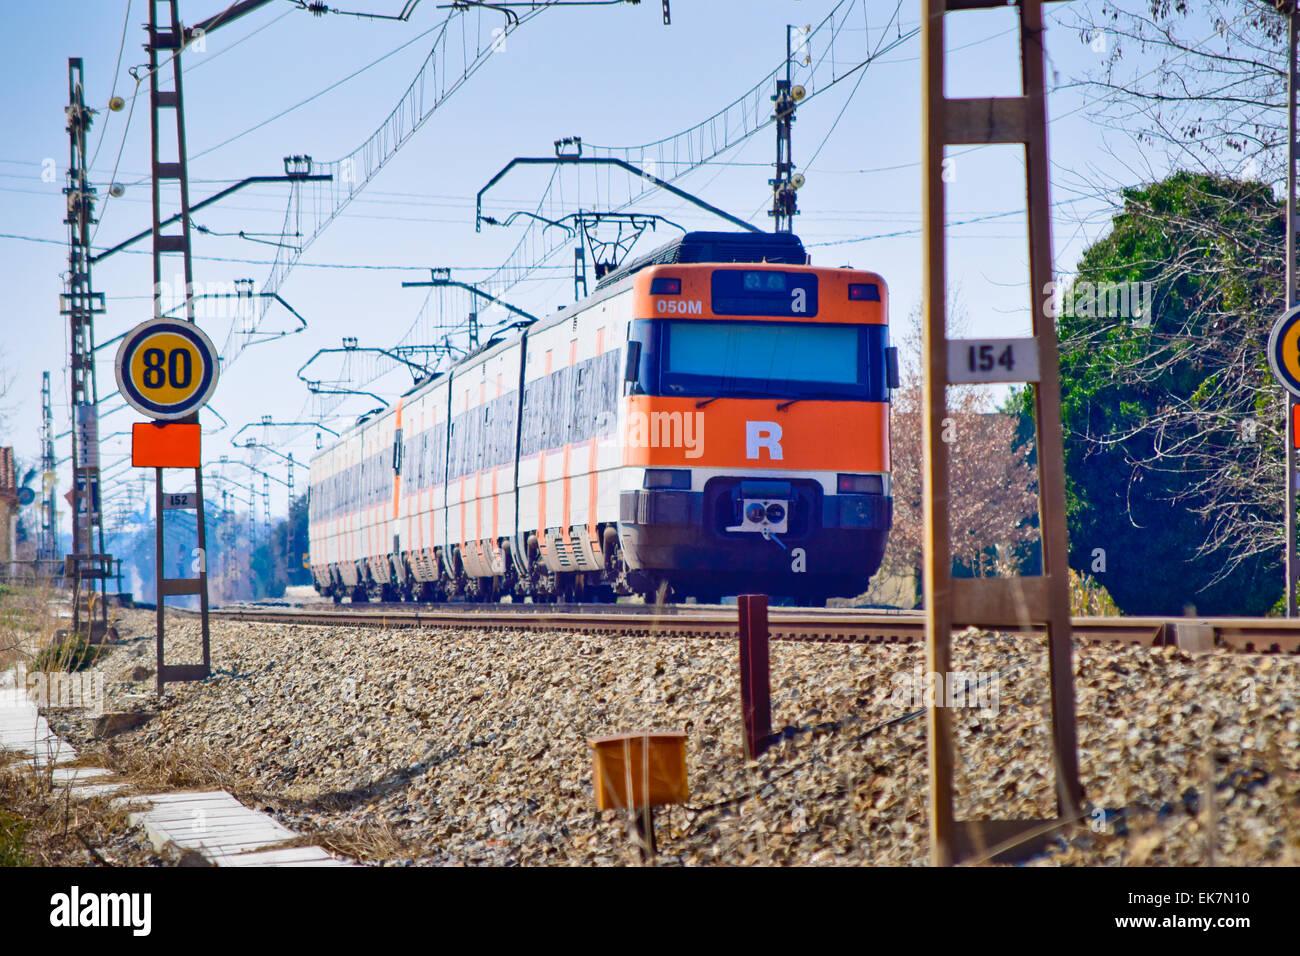 Train. Barcelona province, Catalonia, Spain. - Stock Image